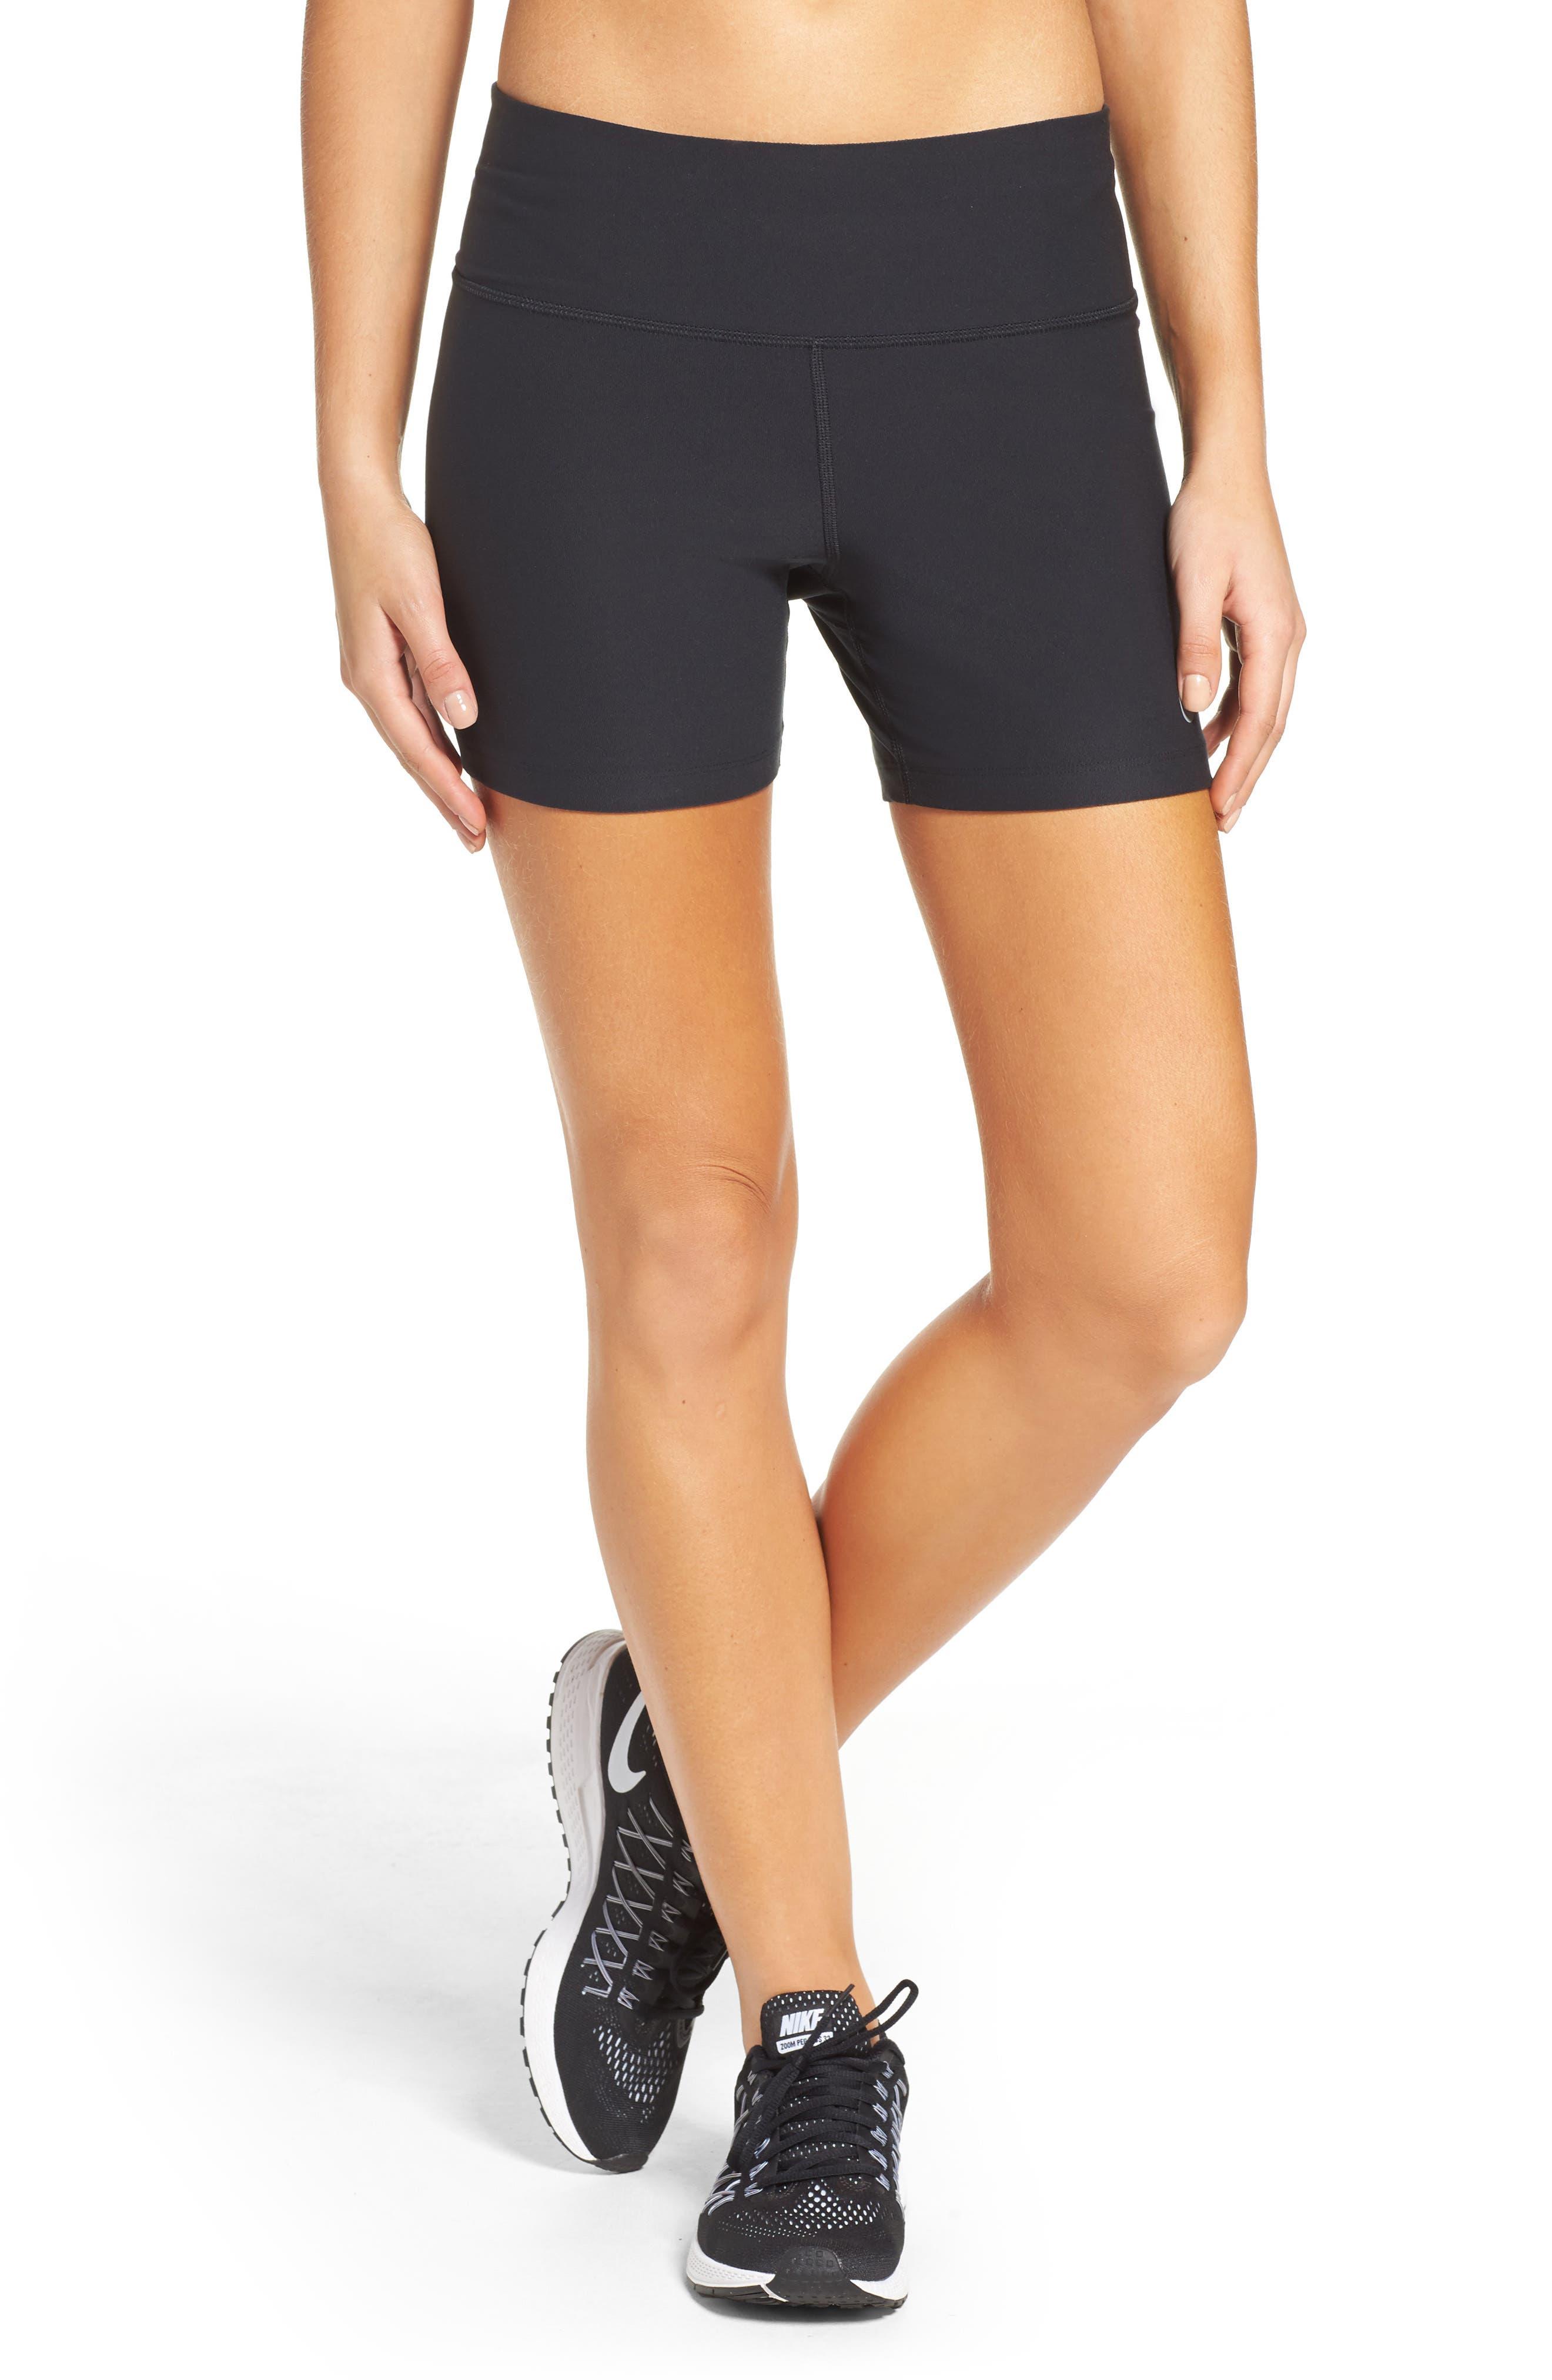 Nike Power Shorts